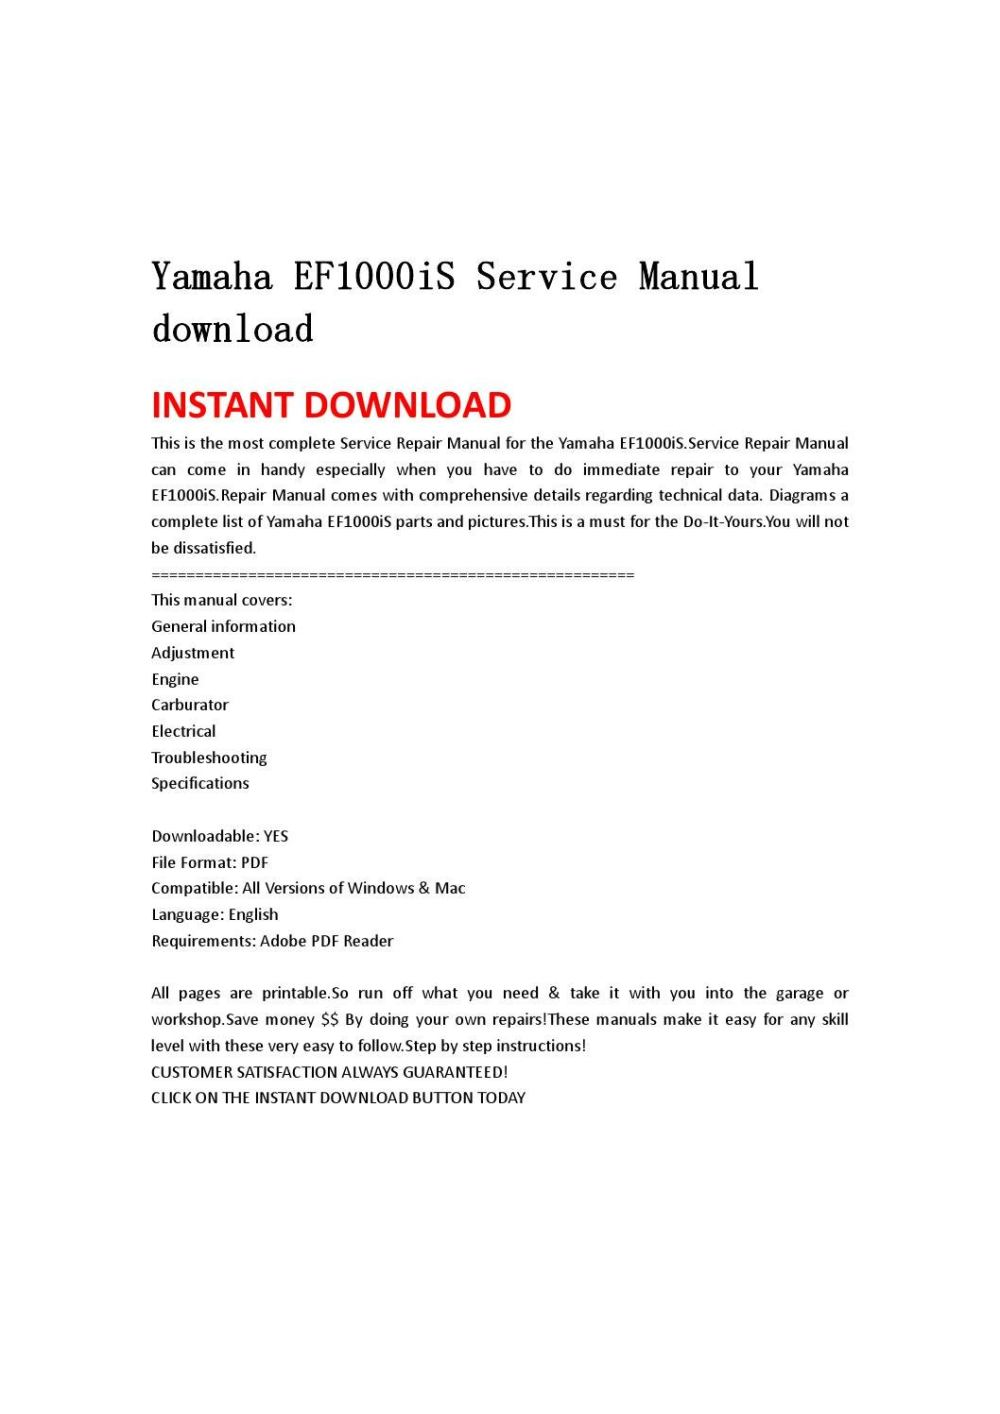 medium resolution of yamaha ef1000is service manual download by iusefjsnen issuuyamaha ef1000is wiring diagram 11